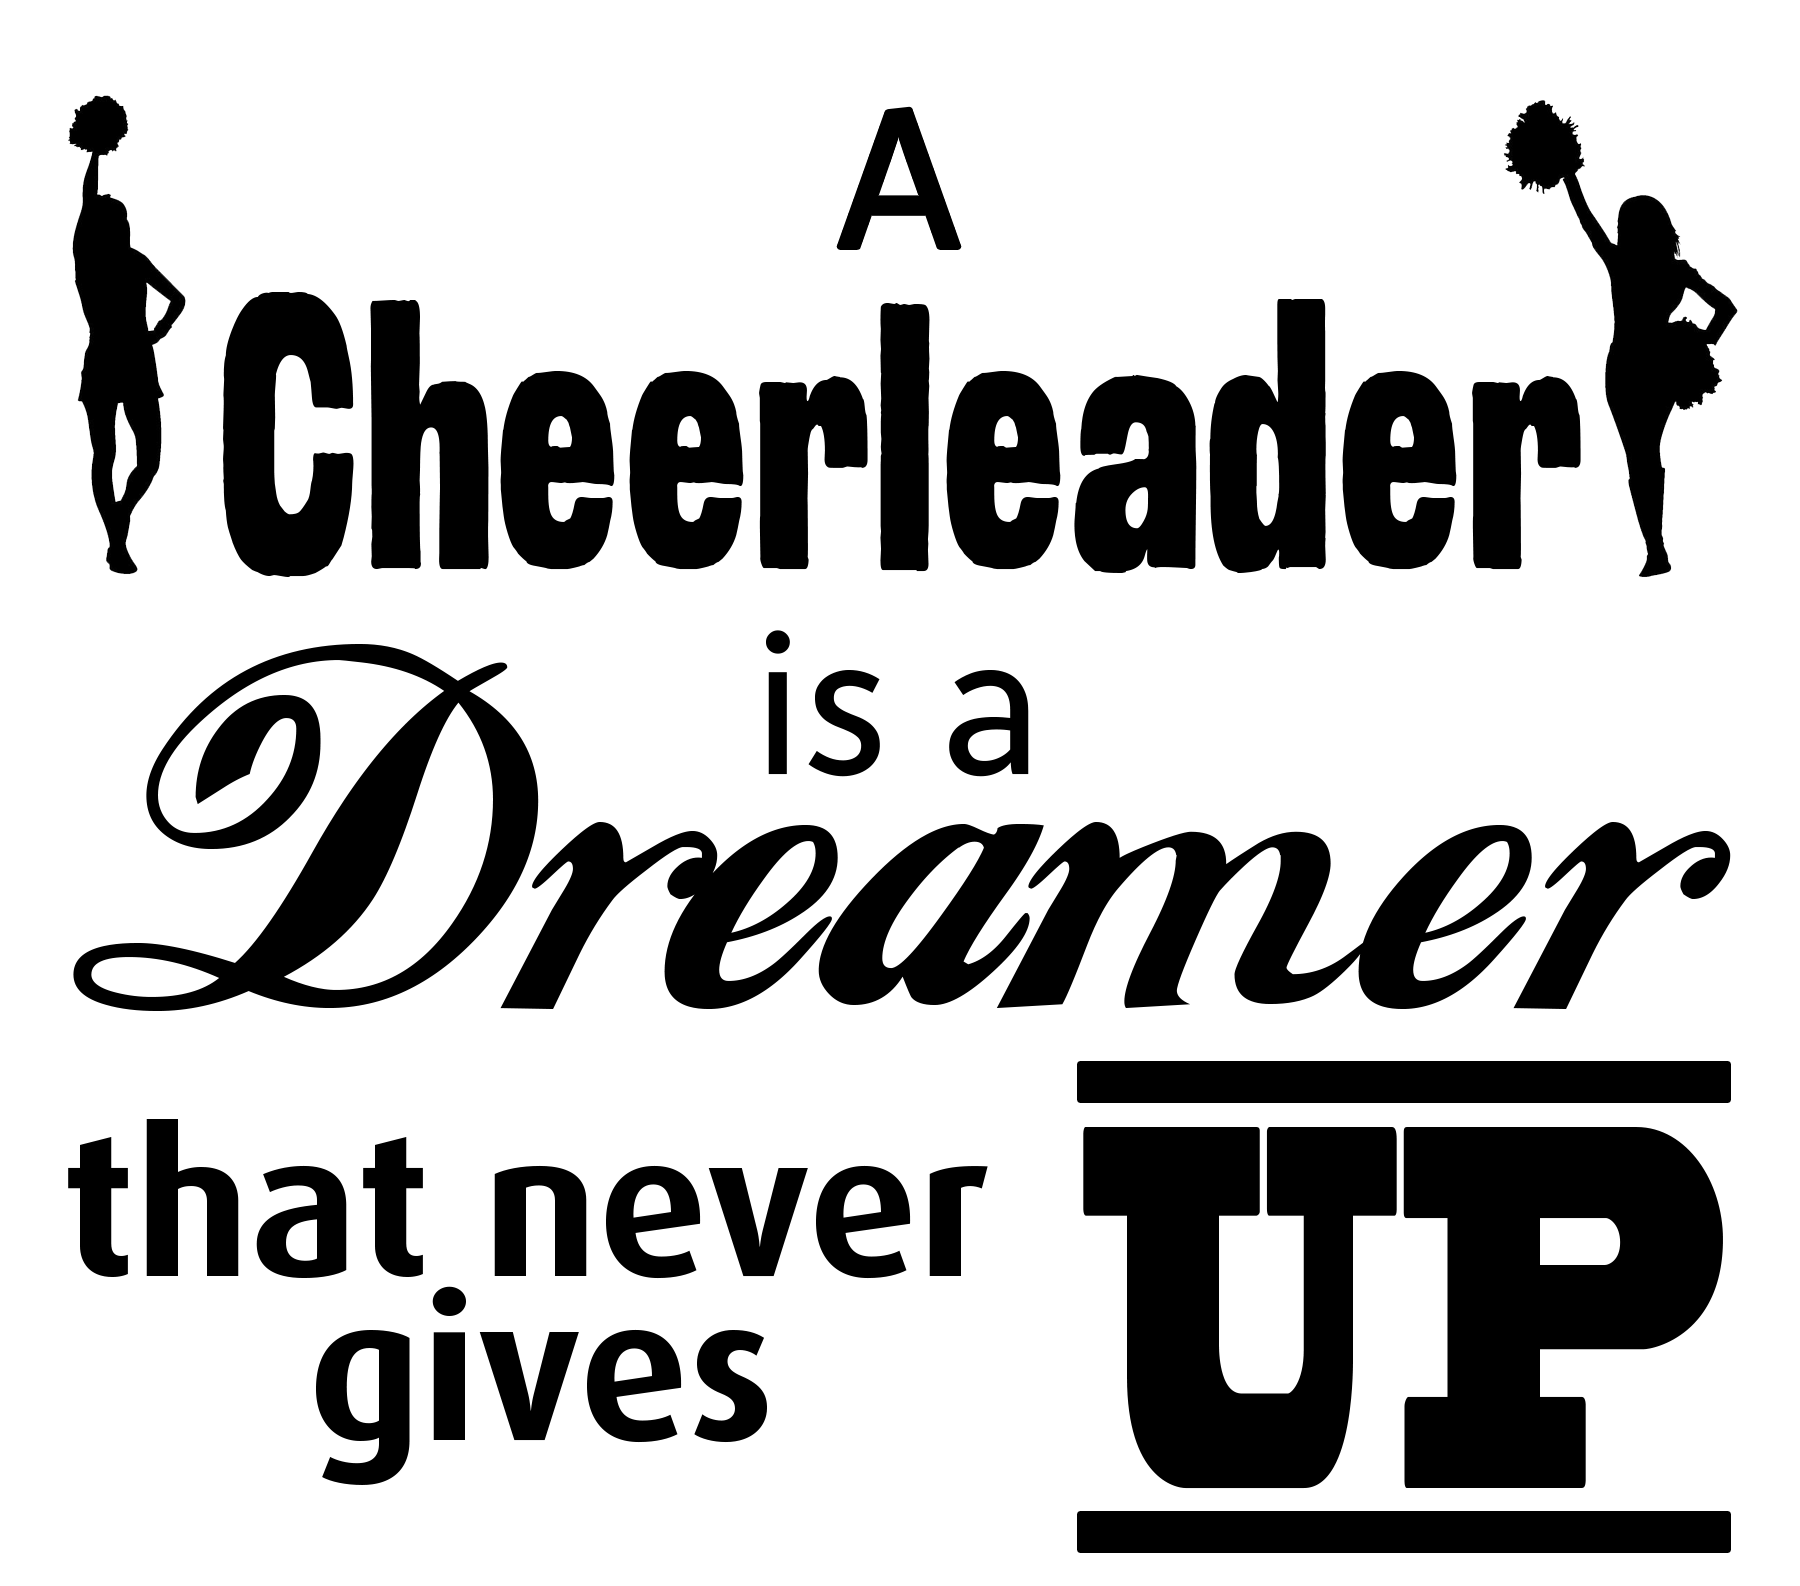 Free Cheerleader SVG Cutting File